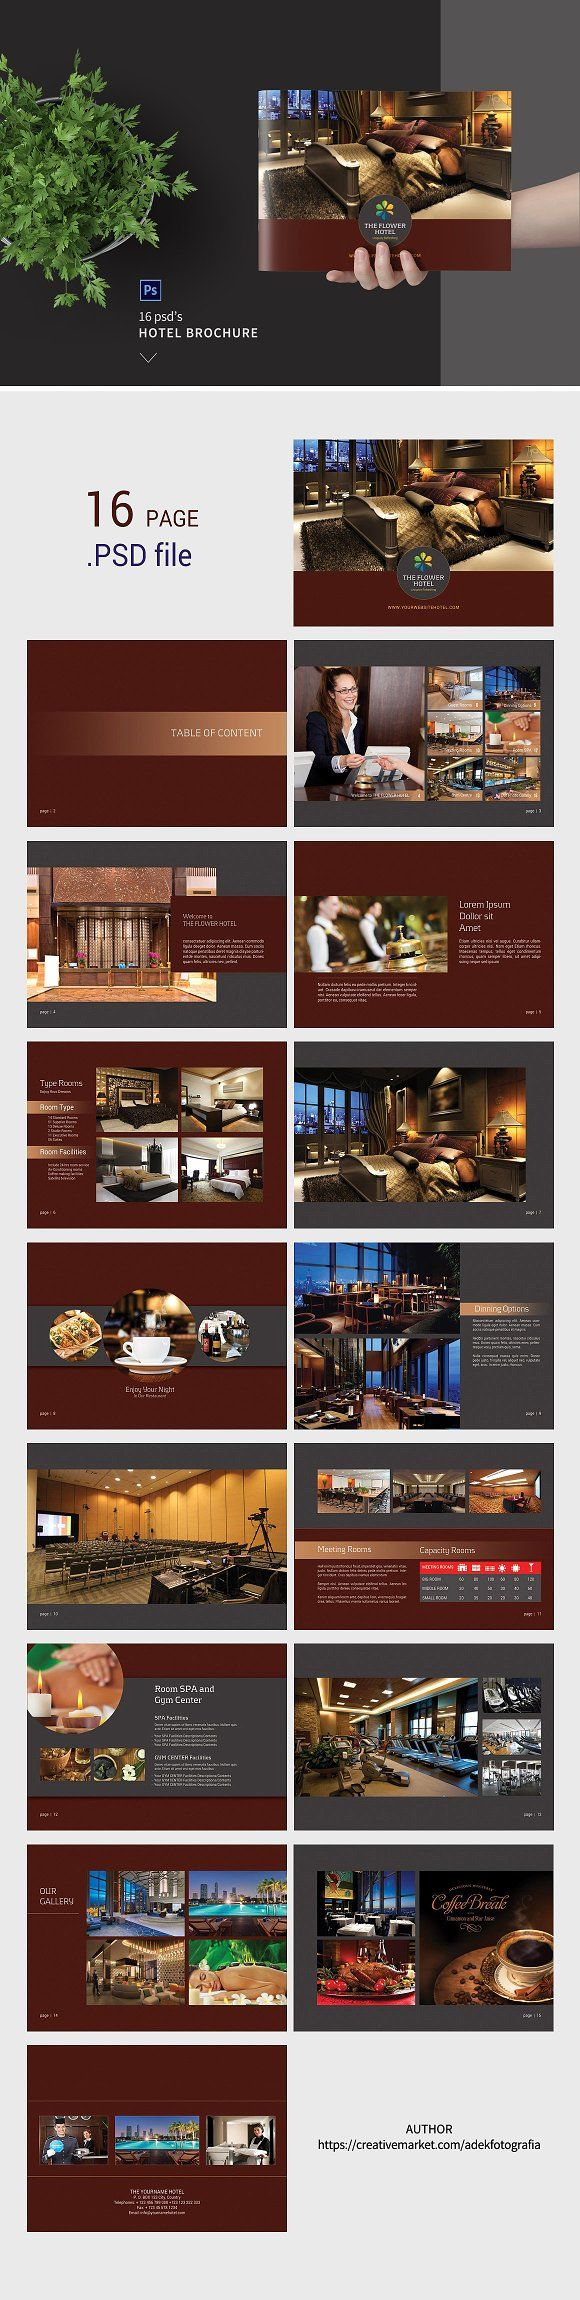 Hotel Brochure by adekfotografia on @creativemarket